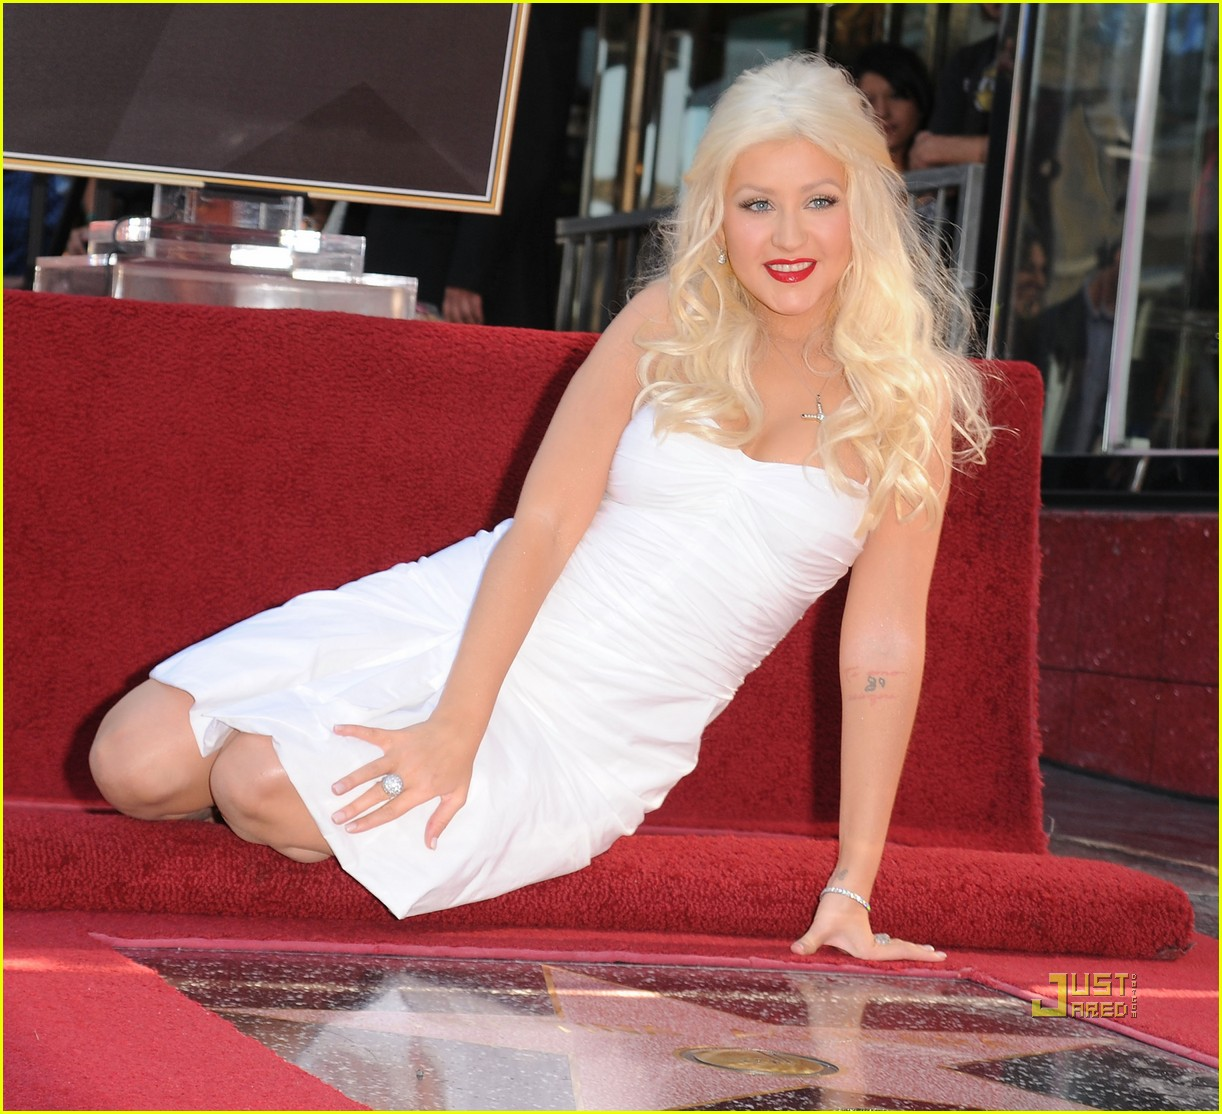 http://4.bp.blogspot.com/_eGLy2bMkiW0/TOGr807ysxI/AAAAAAAABC8/fRFOCtI3XB4/s1600/christina-aguilera-walk-of-fame-star-03.jpg